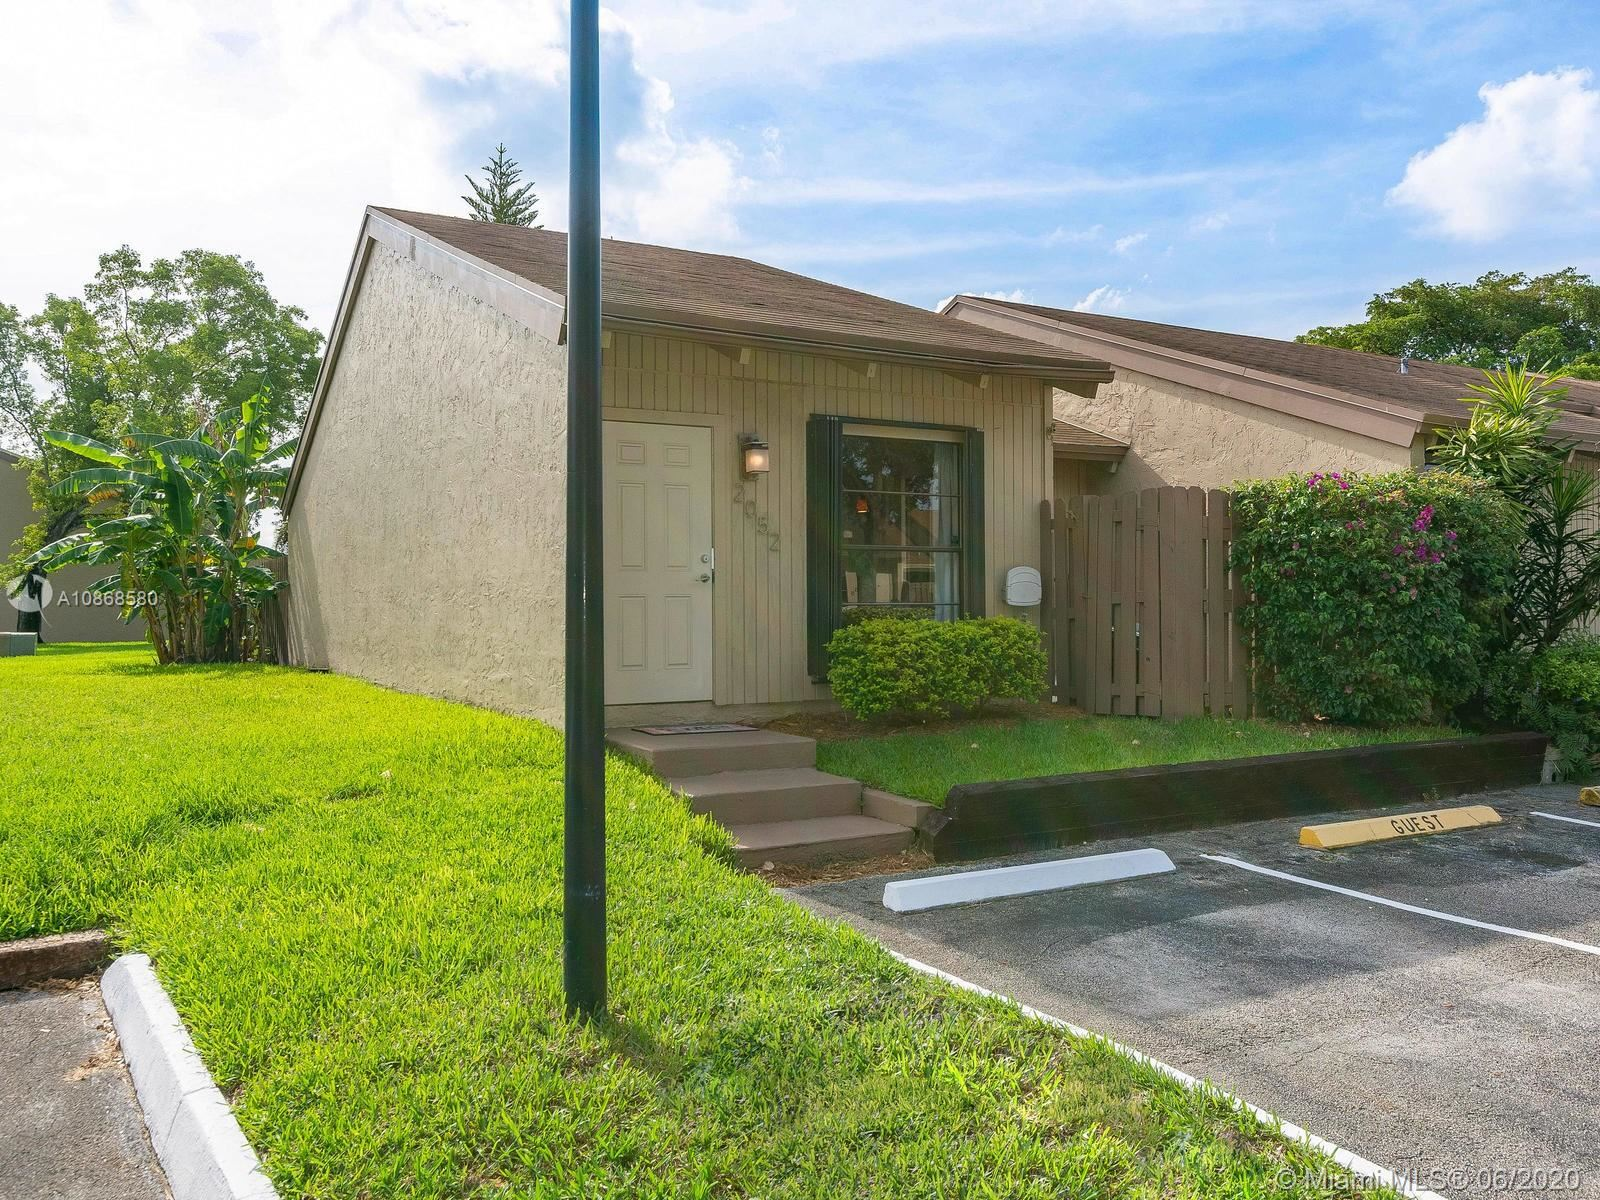 Photo of 2052 SW 82nd Ave, Davie, FL 33324 (MLS # A10868580)